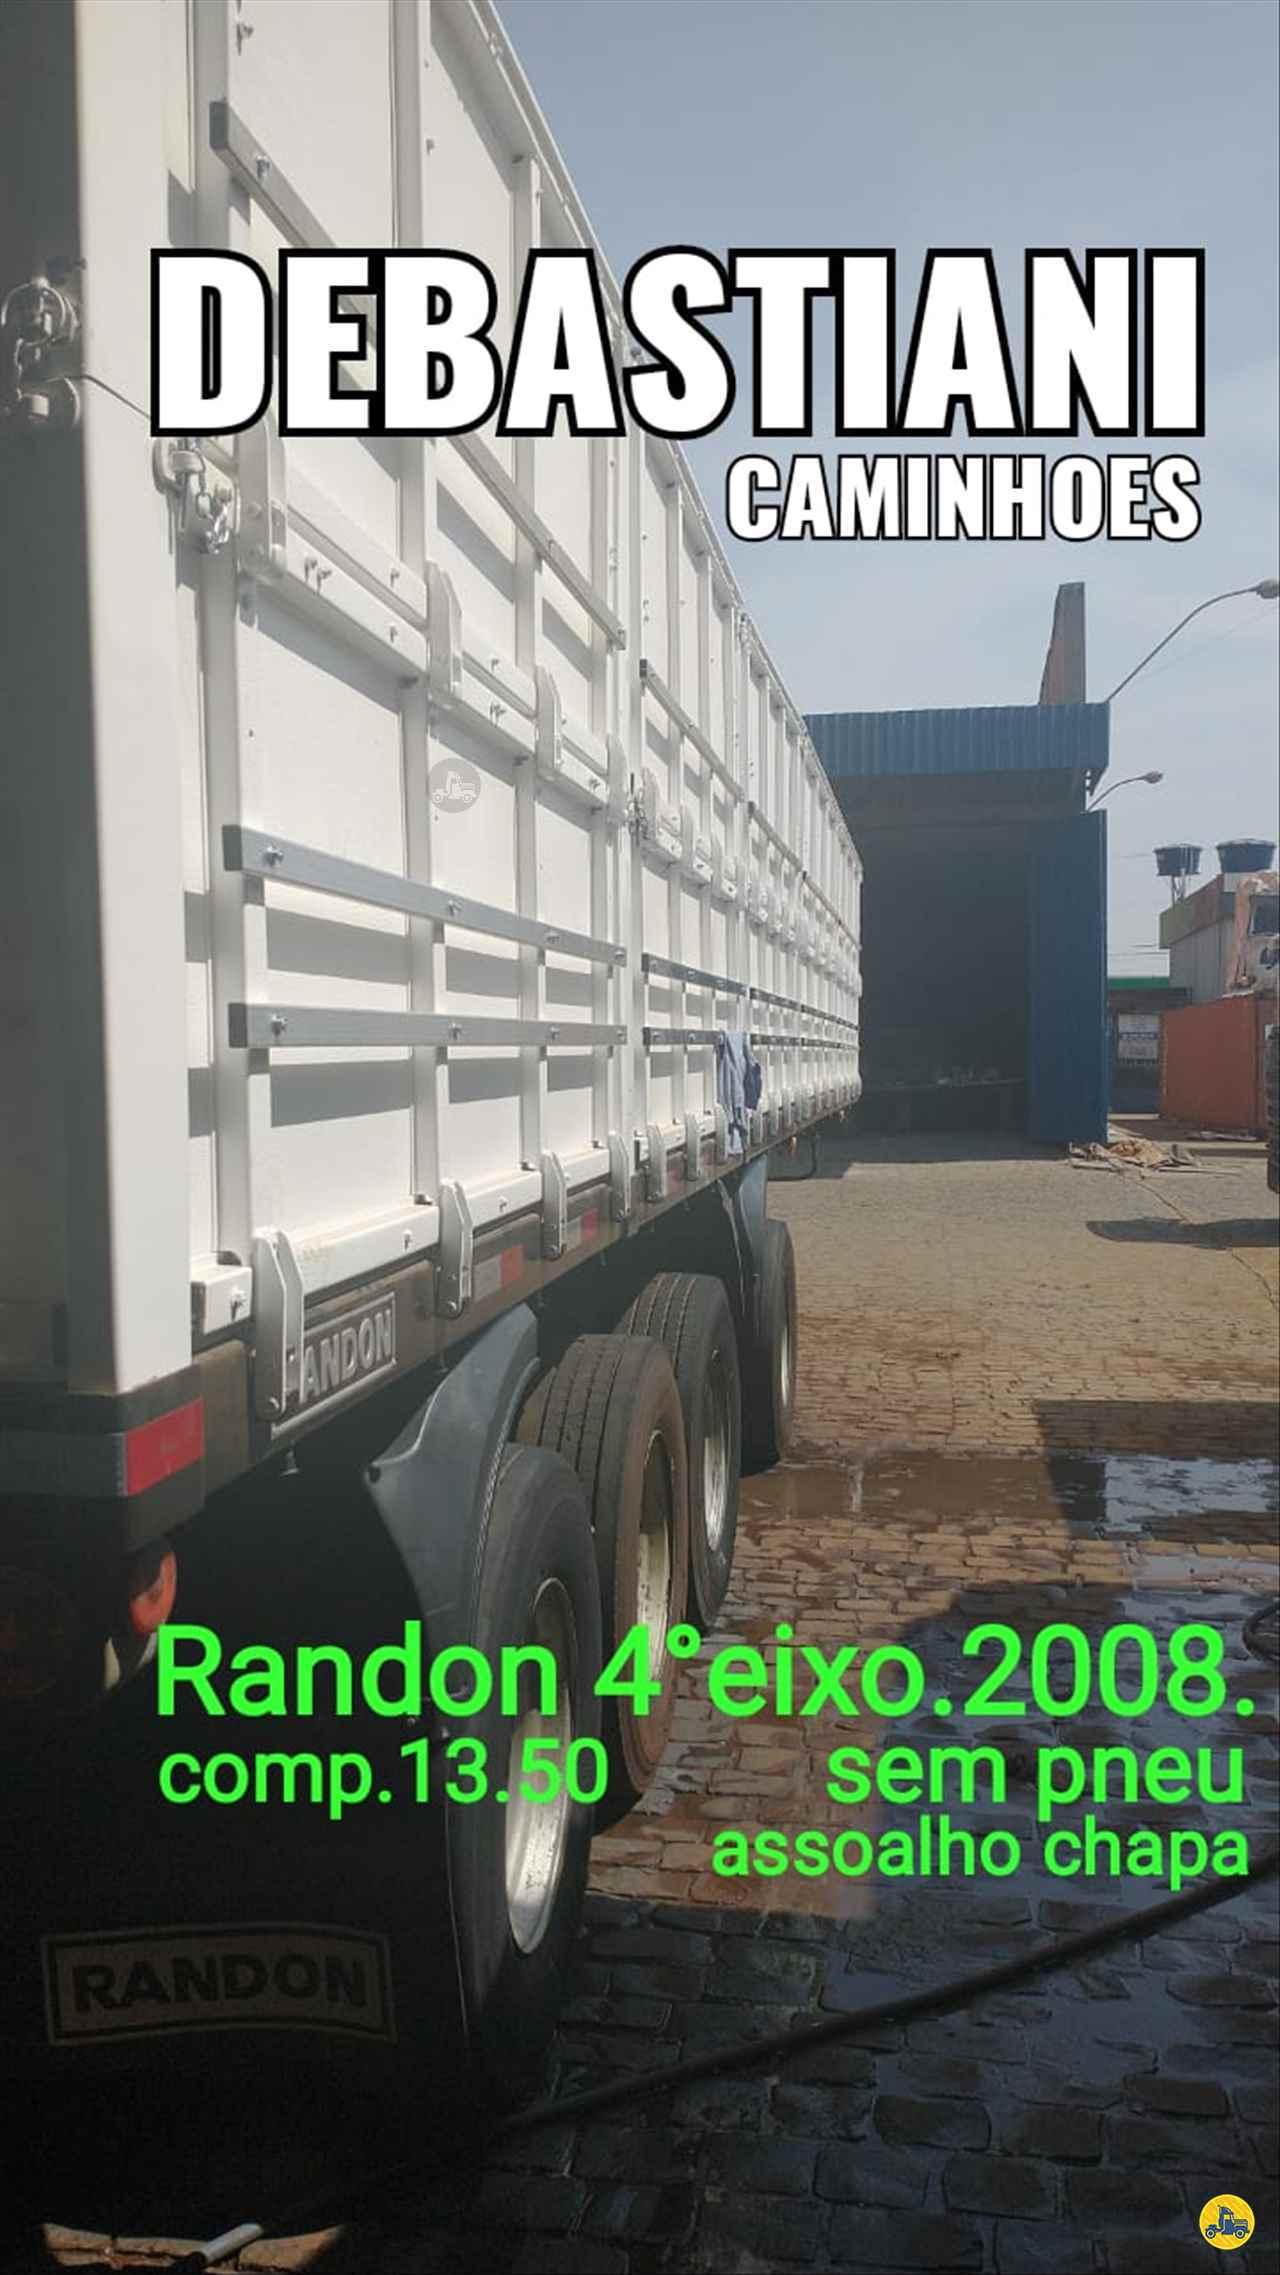 CARRETA SEMI-REBOQUE GRANELEIRO Debastiani Caminhões ANAPOLIS GOIAS GO